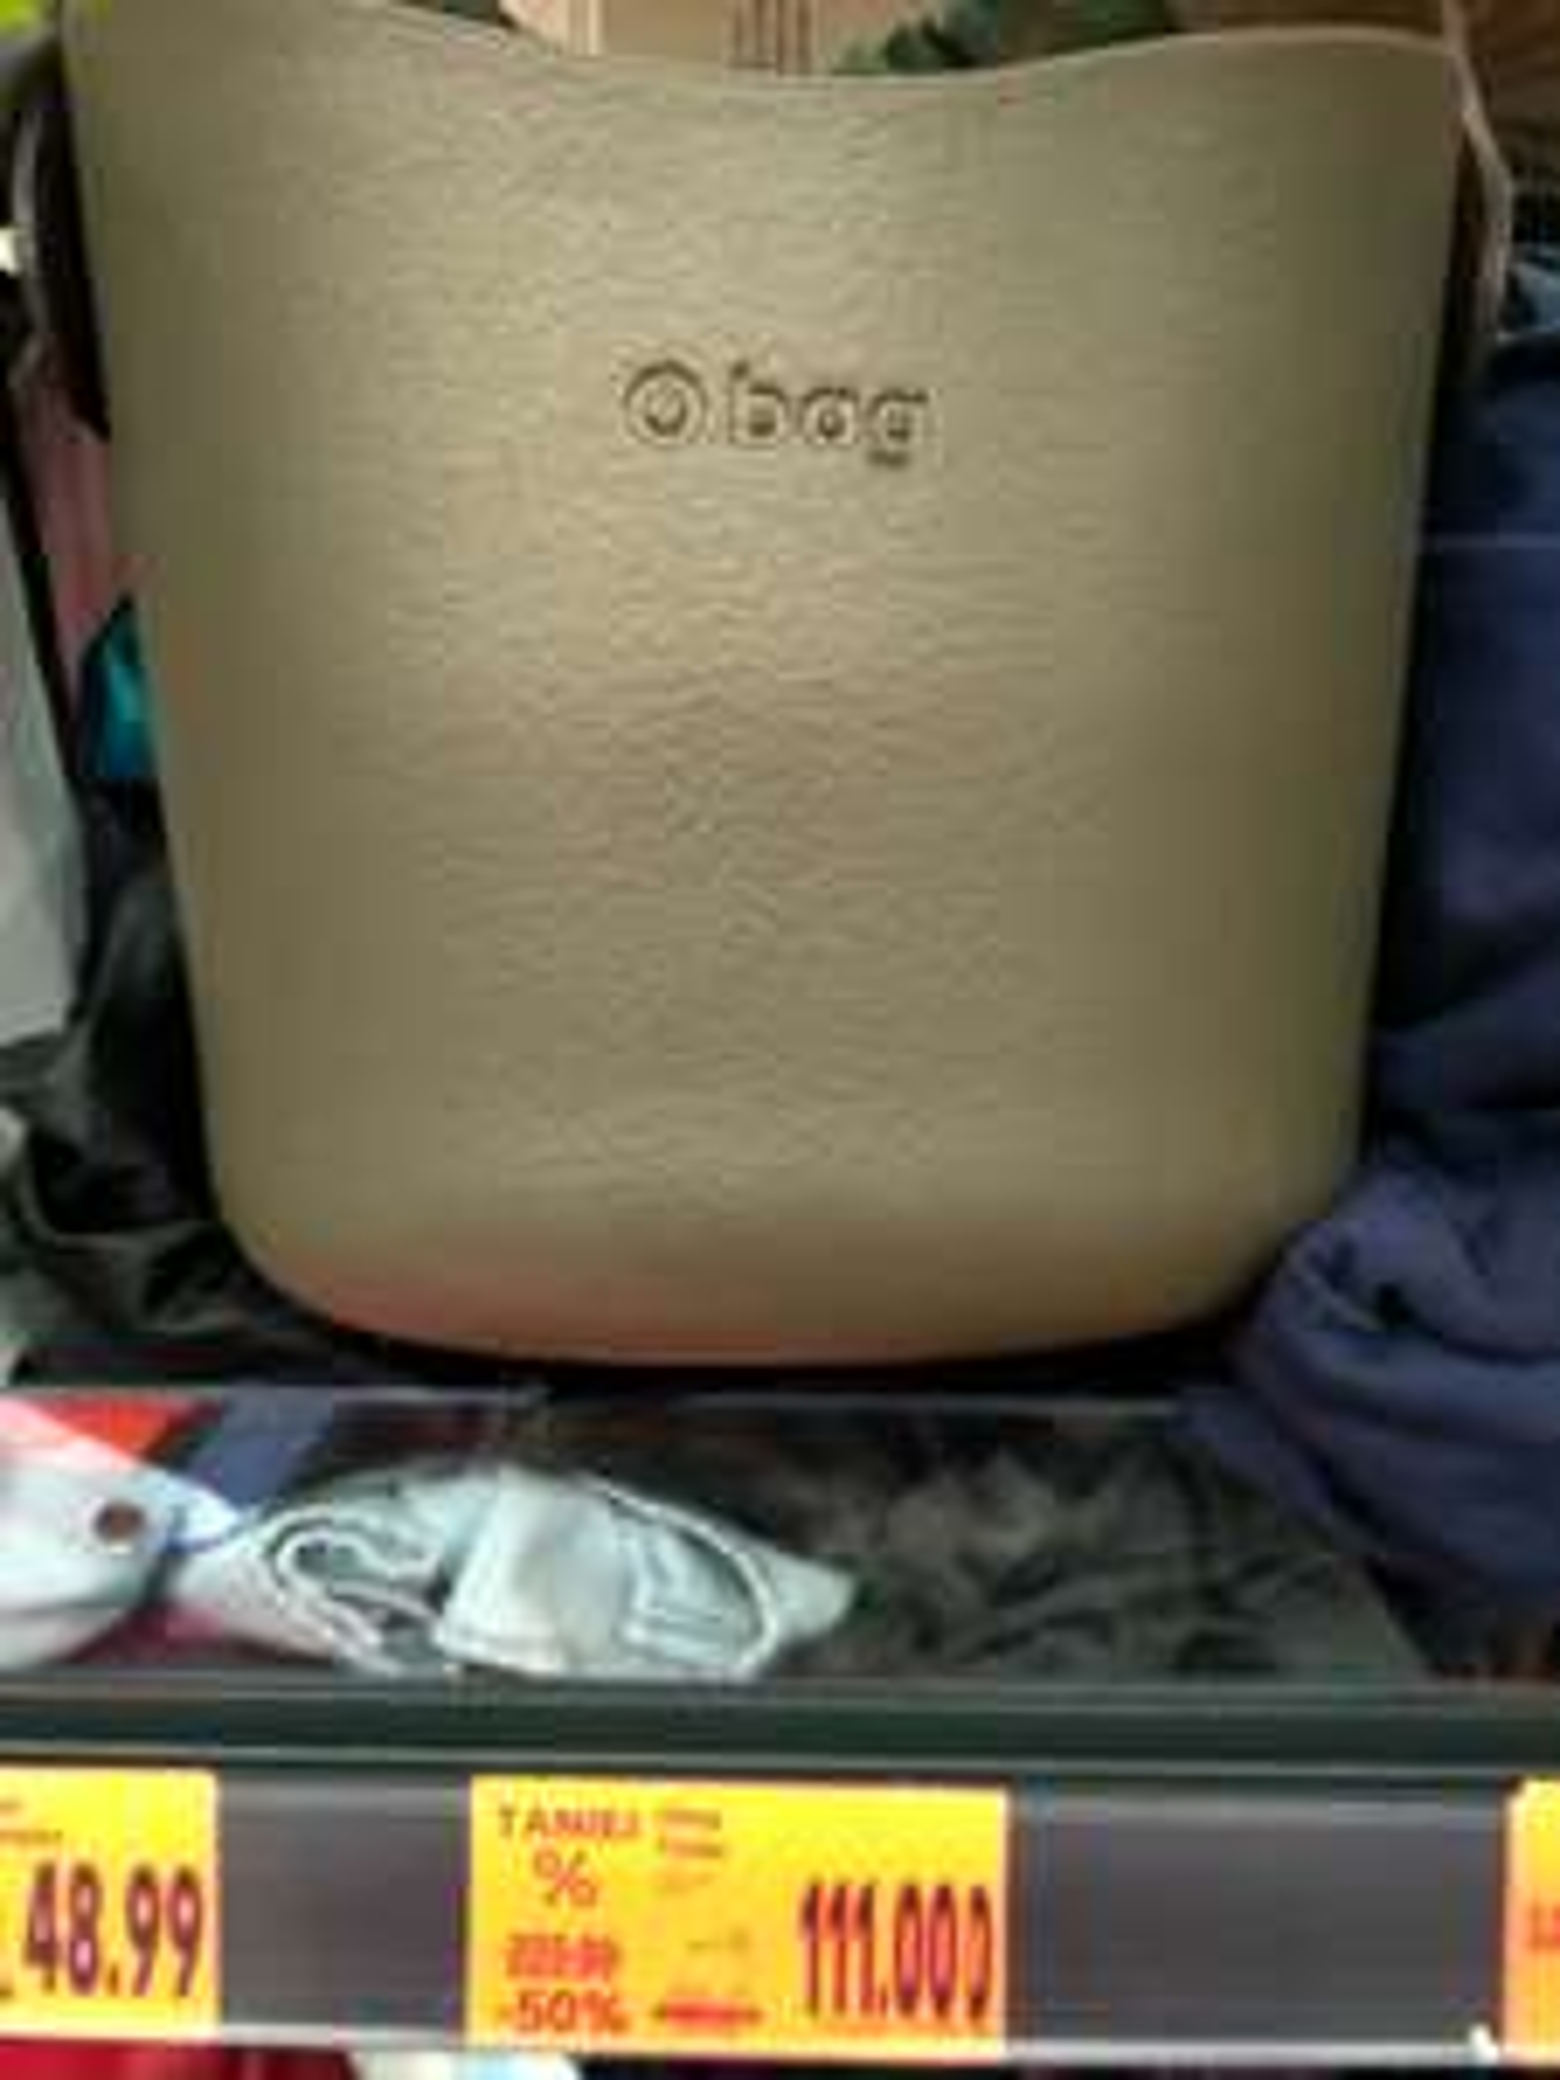 Kaufland Obag torba 111,00